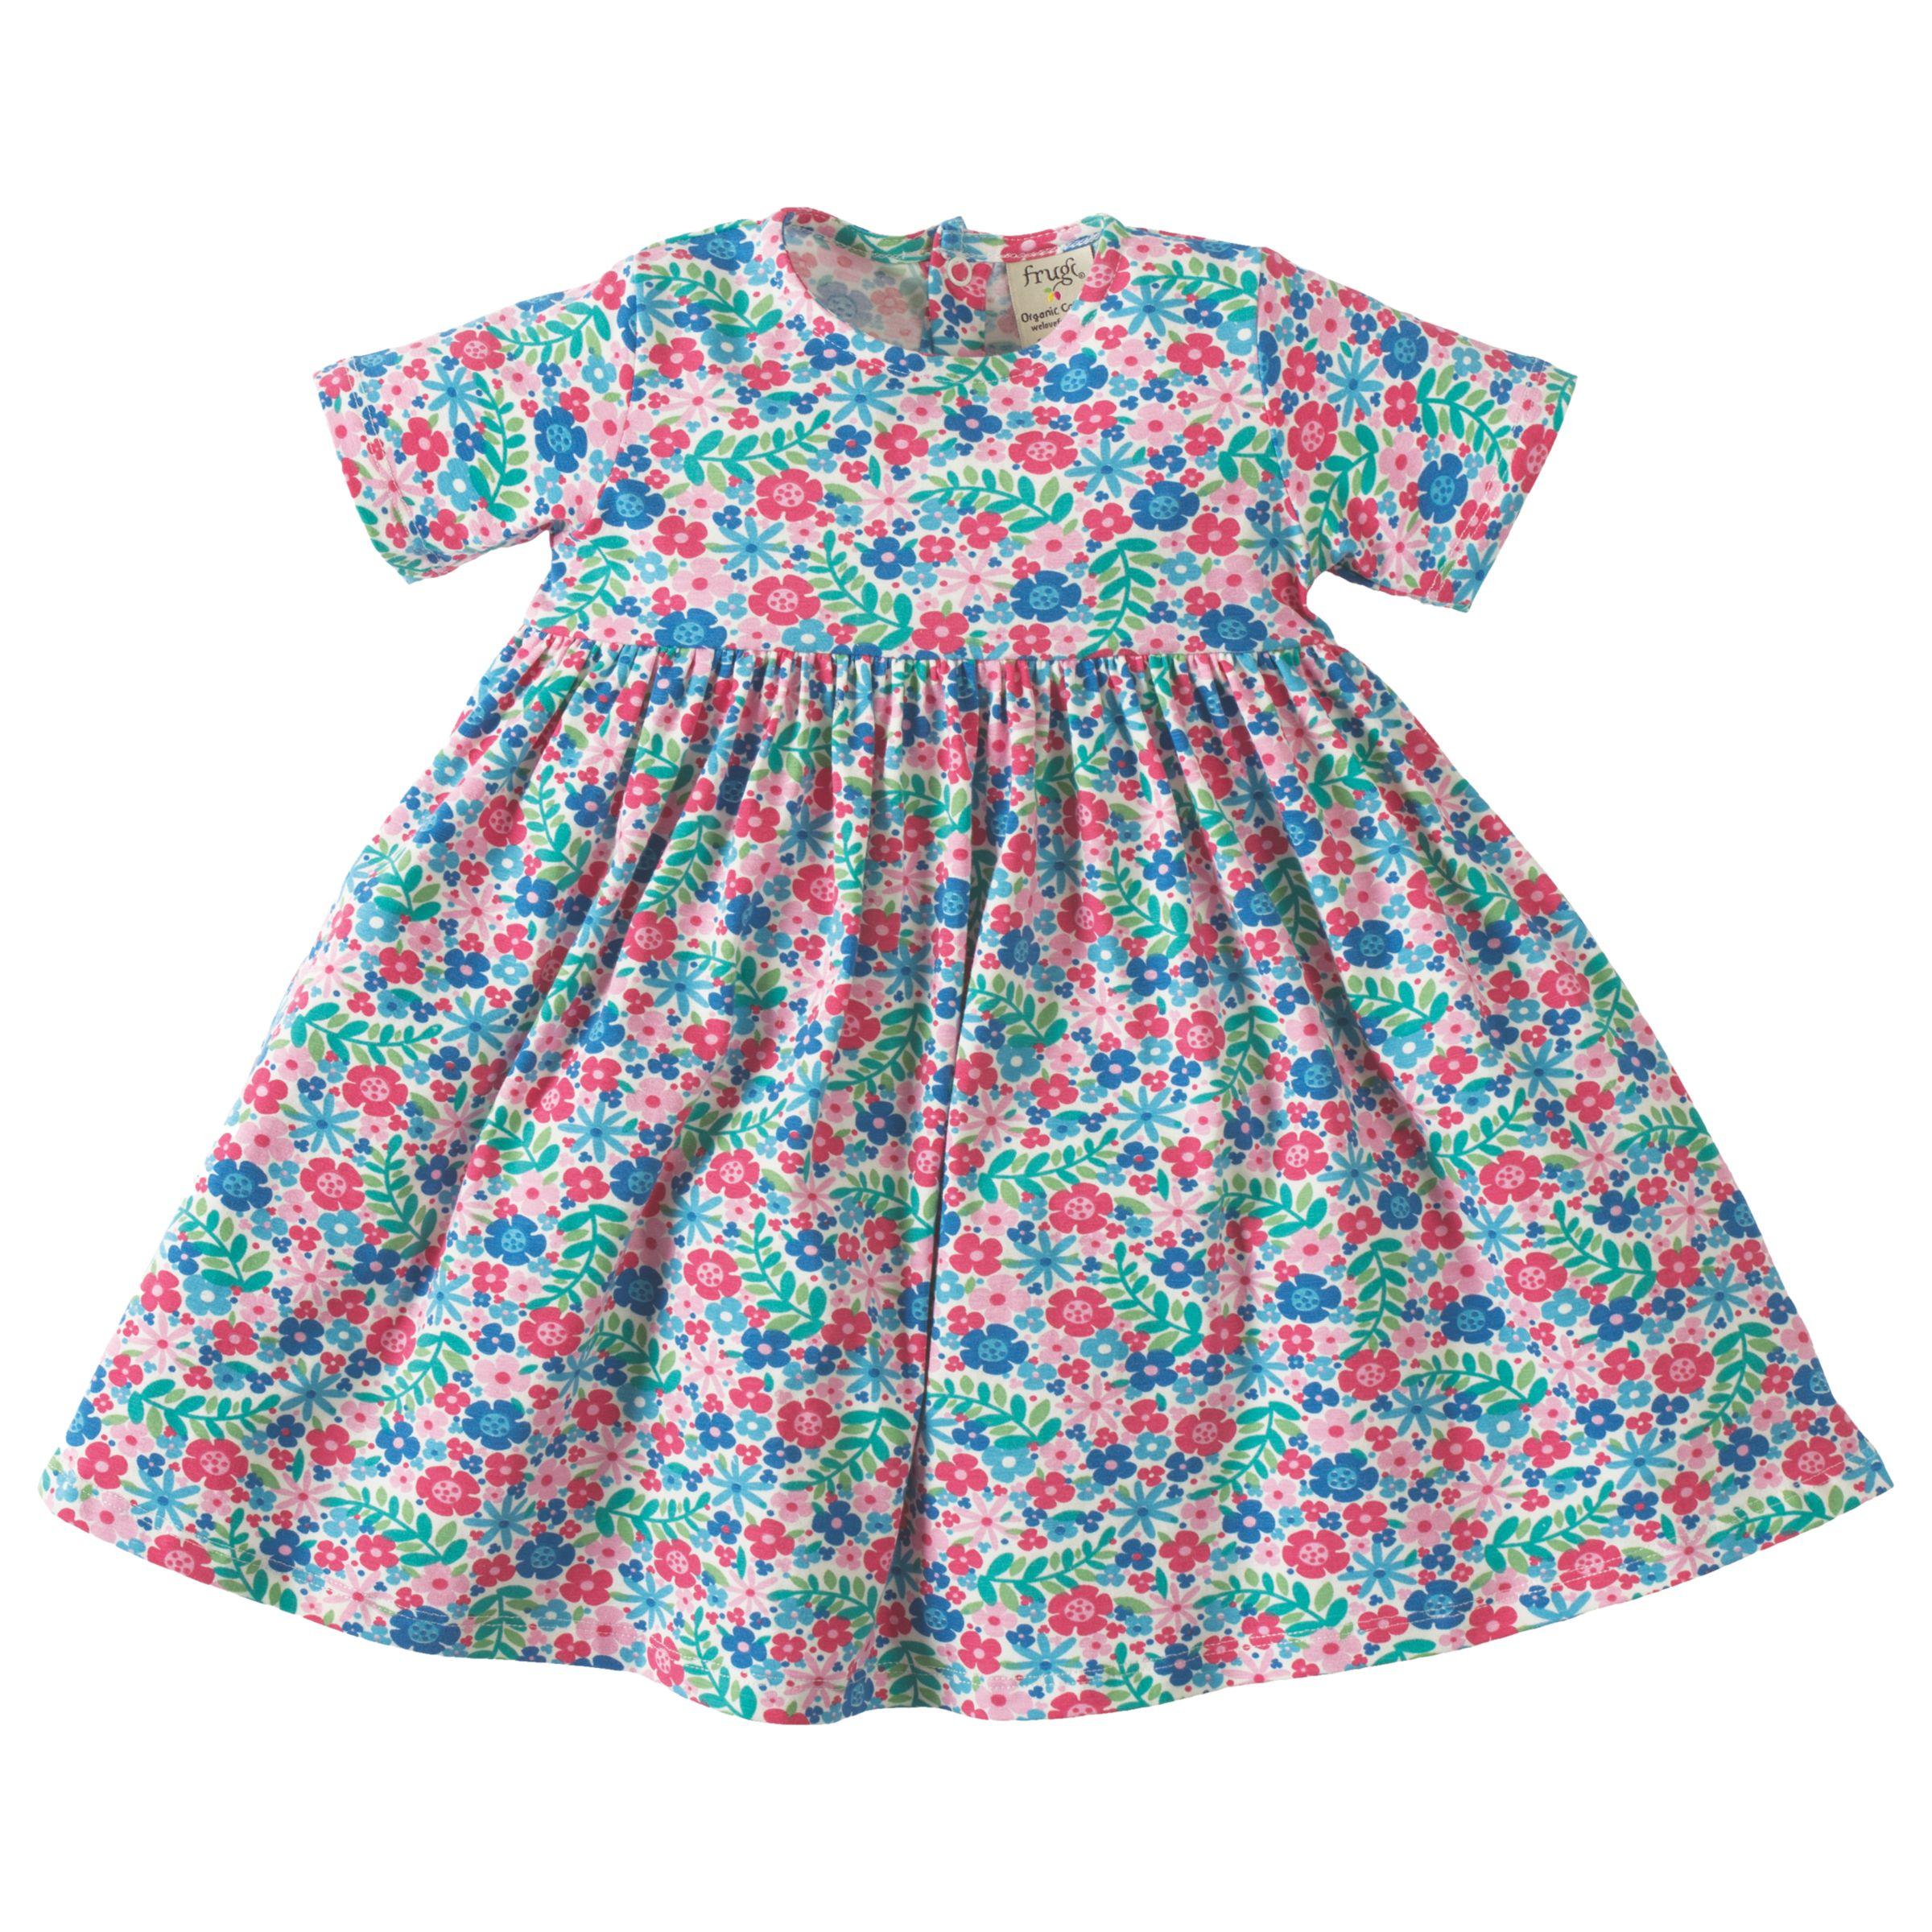 Frugi Frugi Organic Baby Ditsy Garden Romper Dress, Multi